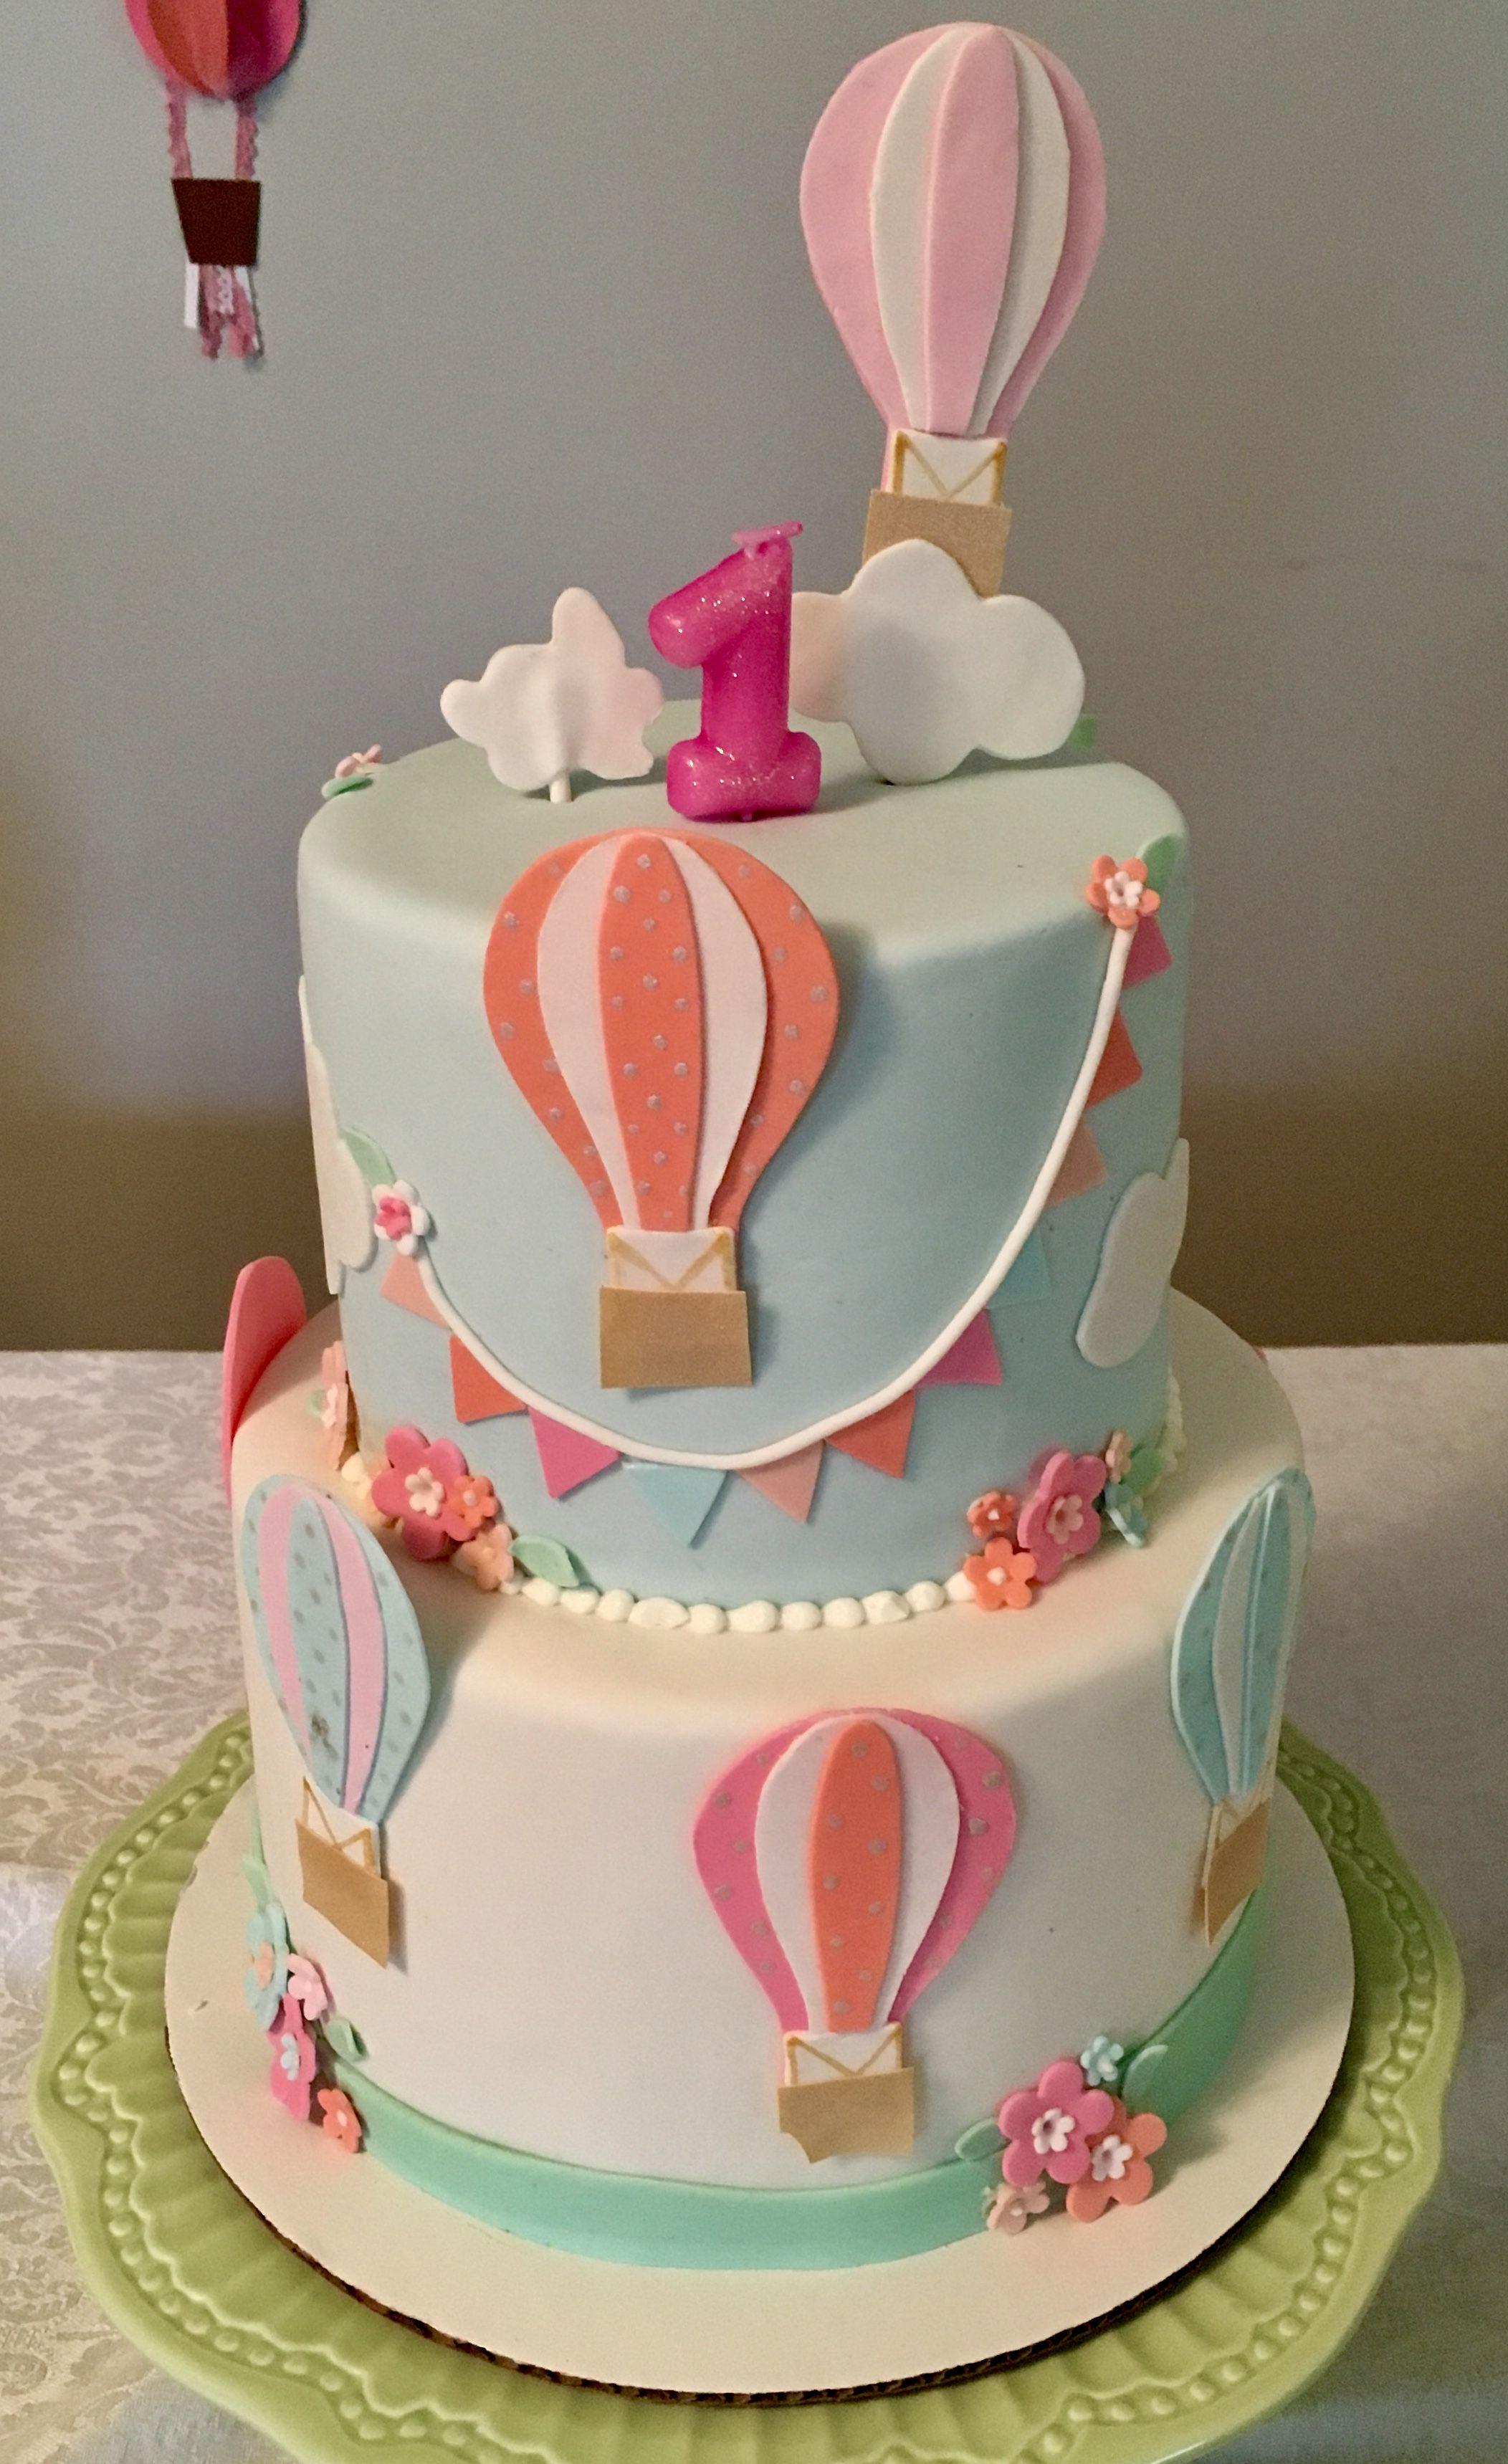 Tremendous 1St Birthday Hot Air Balloon Cake With Images Hot Air Balloon Funny Birthday Cards Online Necthendildamsfinfo